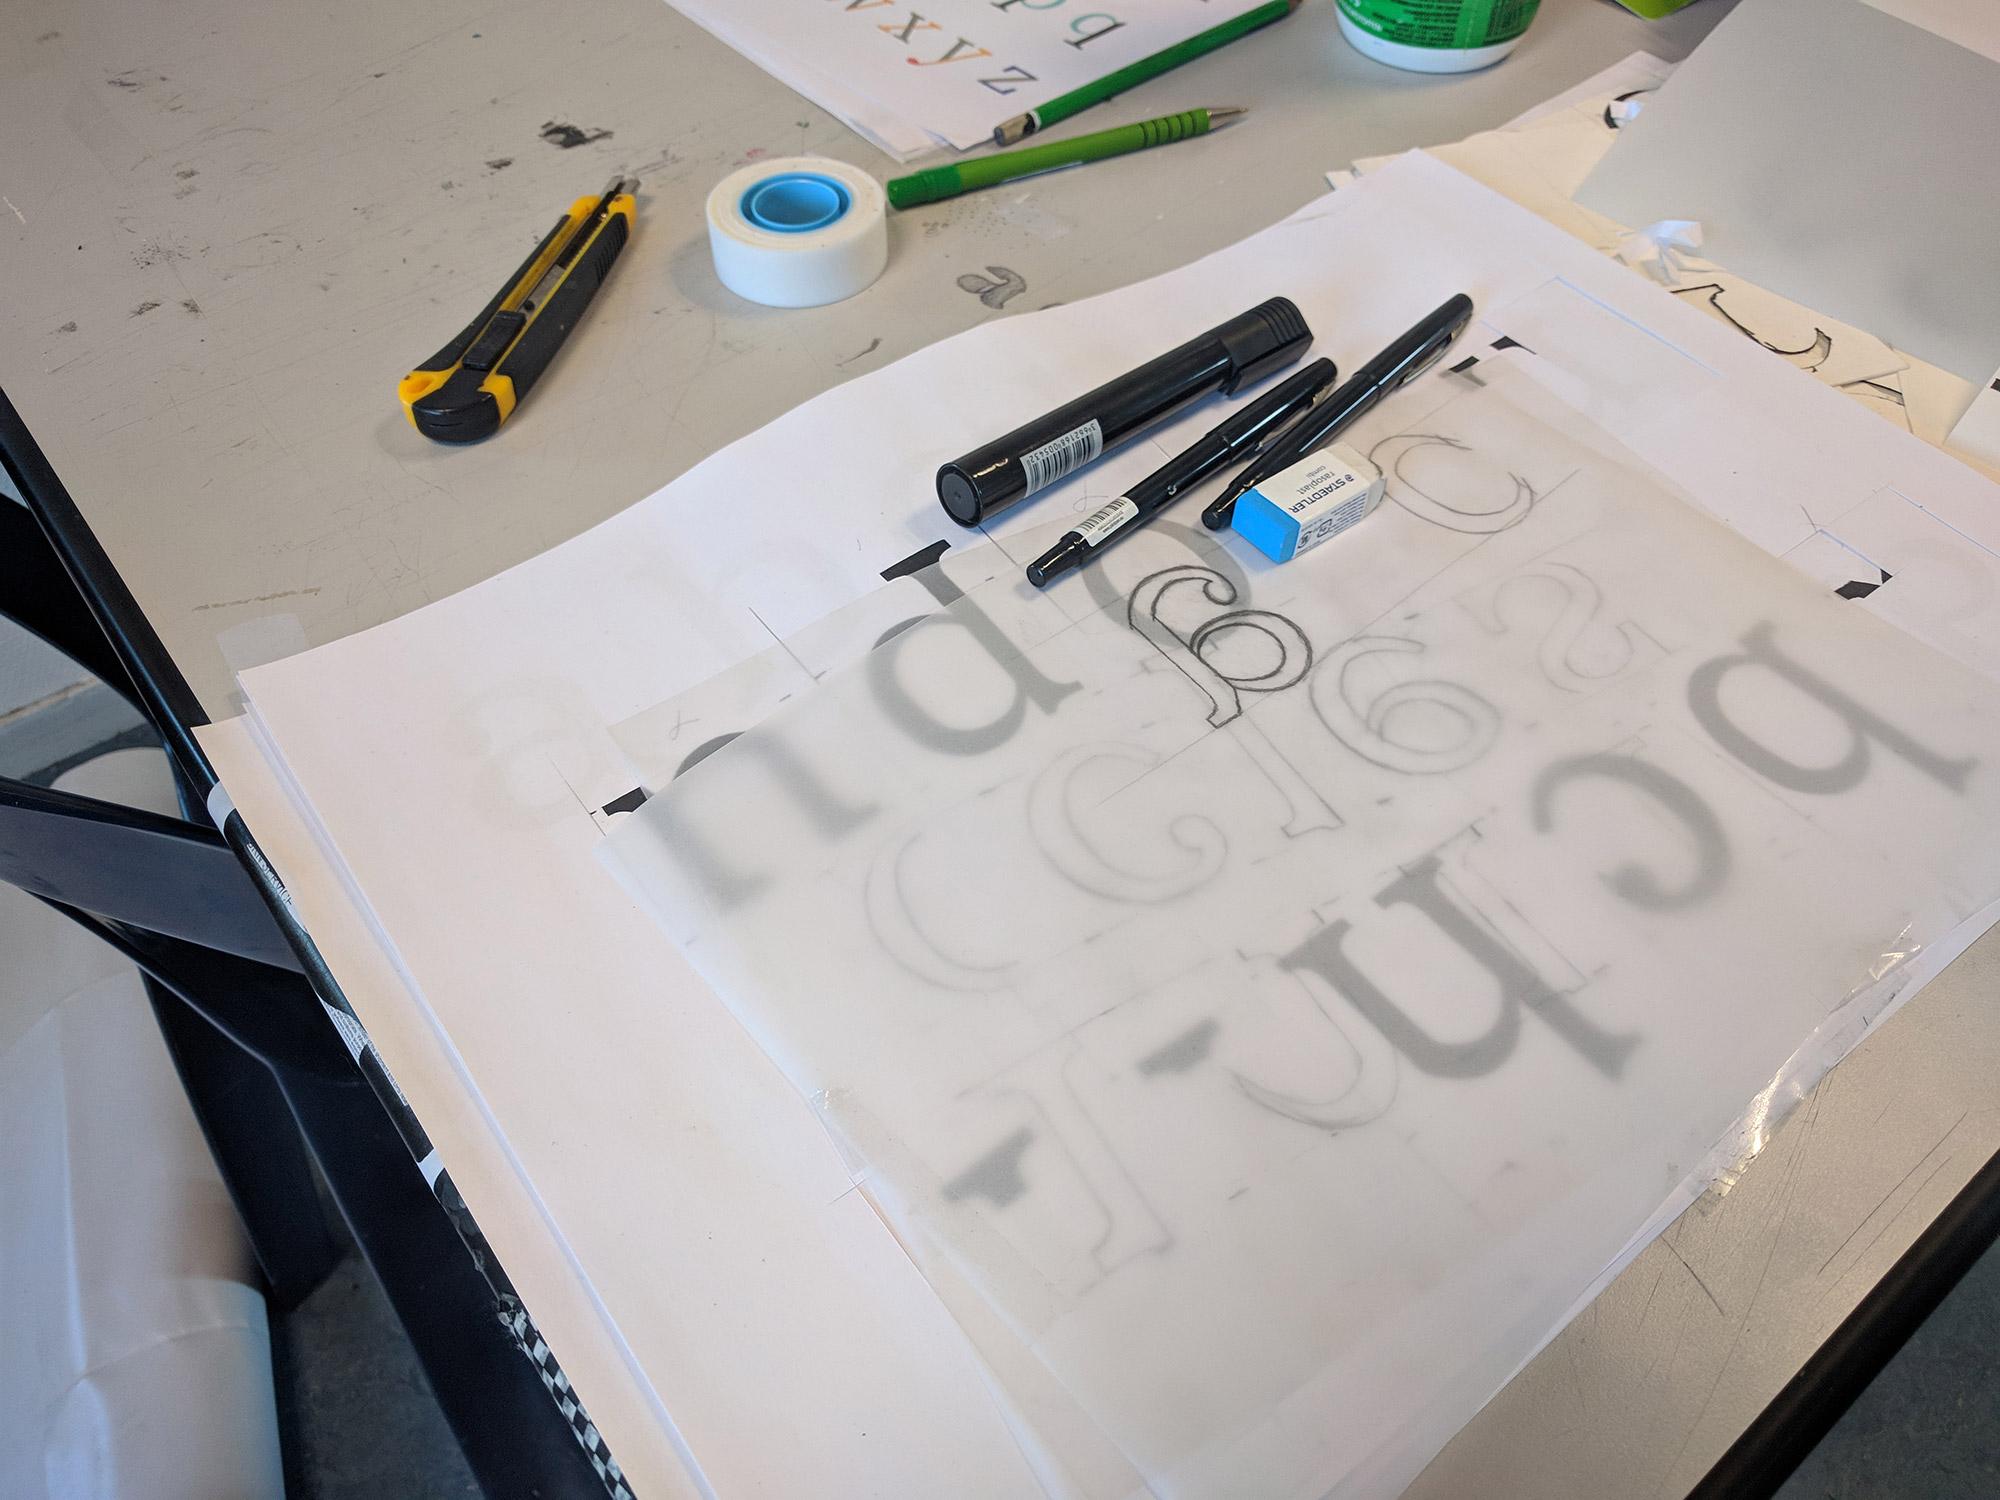 psm_workshop_roxane_gataud_07.jpg